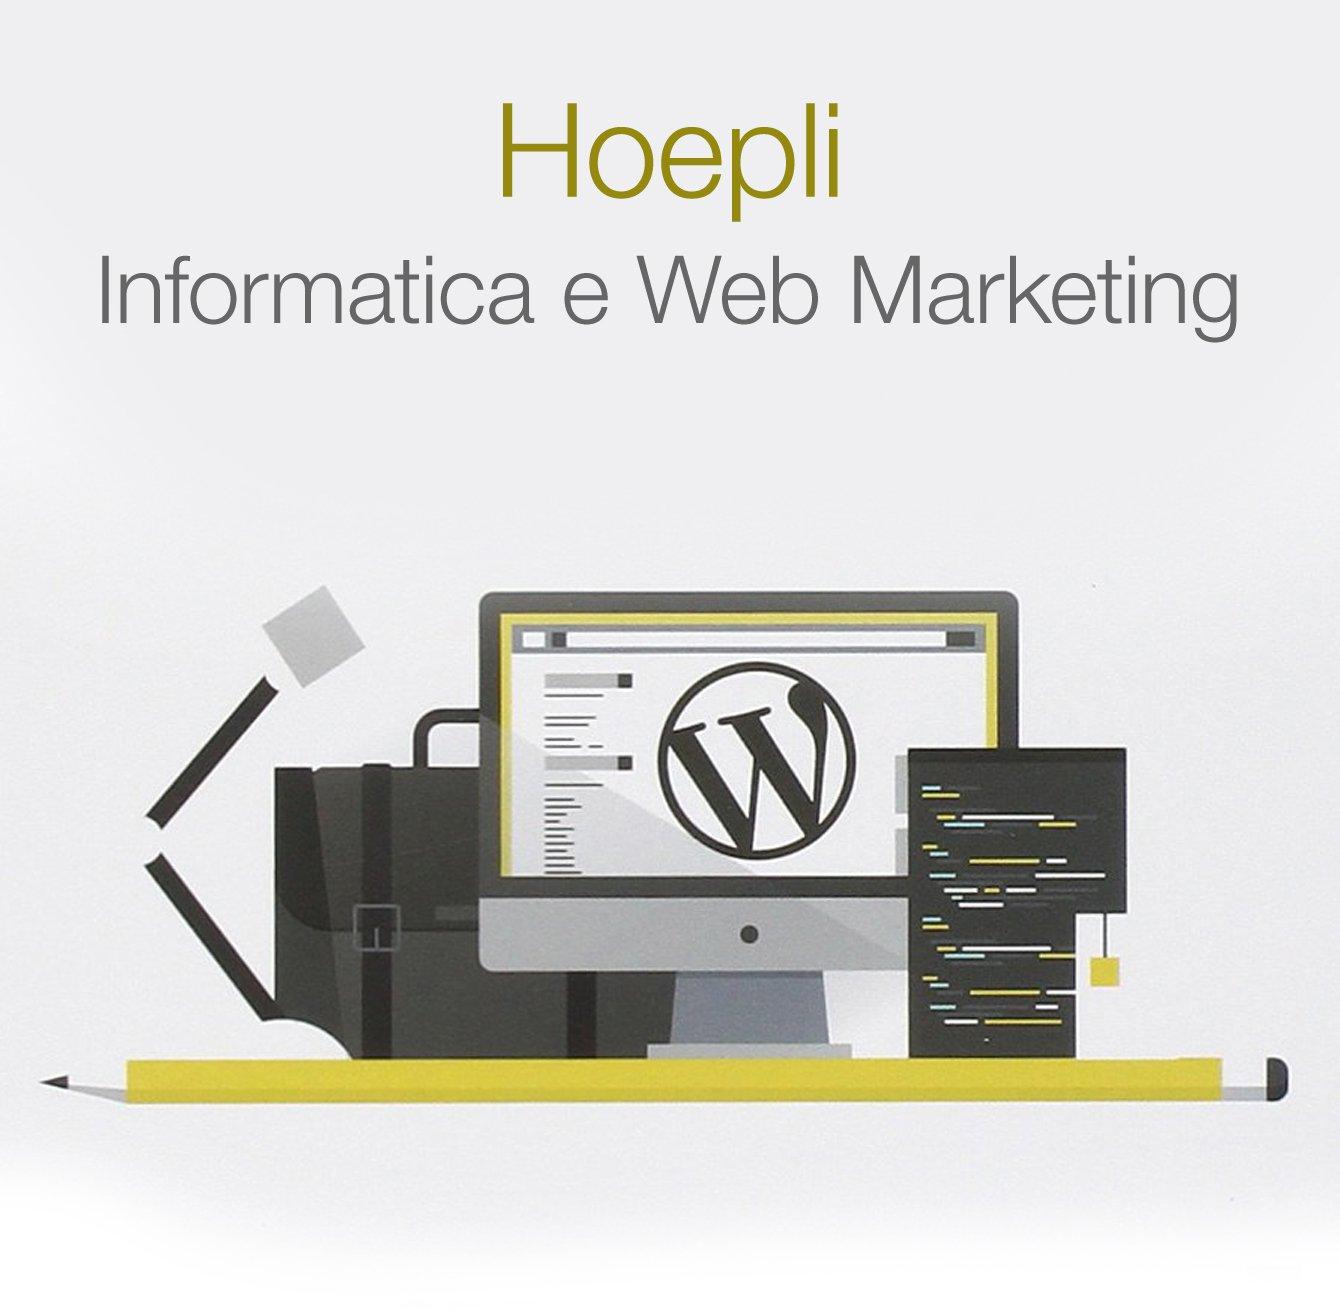 Hoepli Informatica e Web Marketing